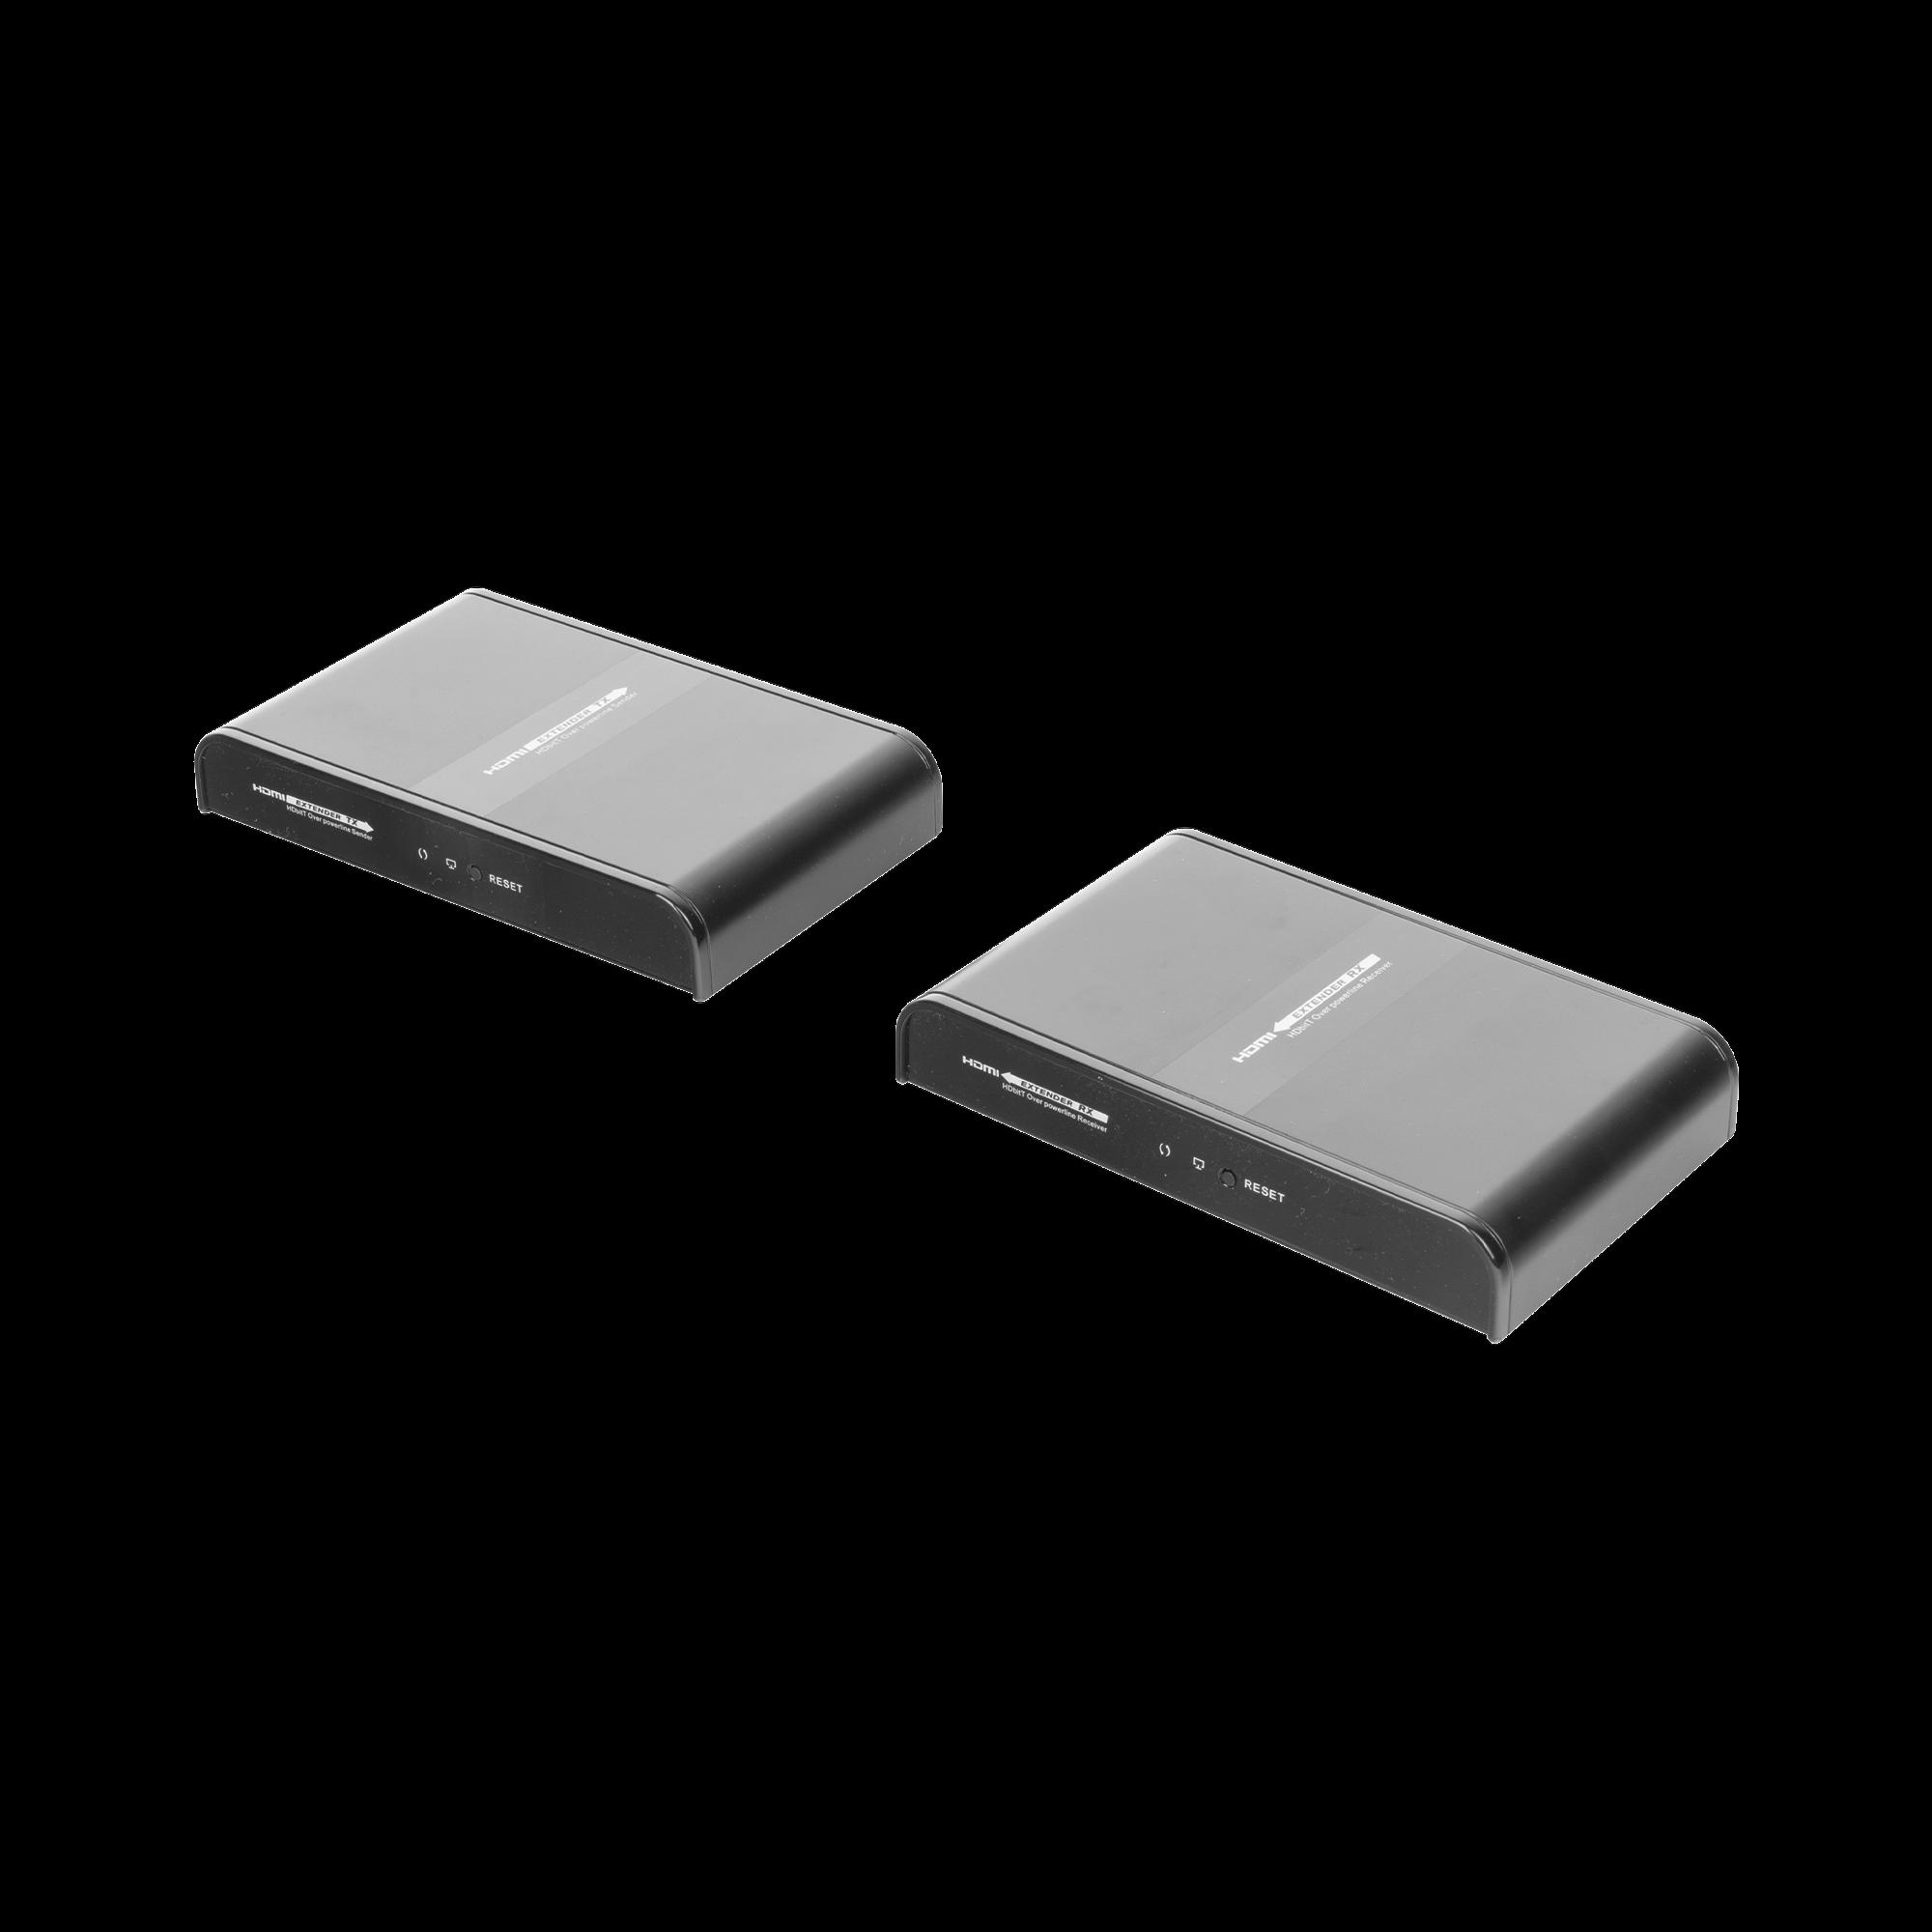 Kit extensor HDMI sobre Powerline con loop HDbitT, protocolo HDbitT, compatible con HDCP. Distancia de transmisión hasta 300 metros.